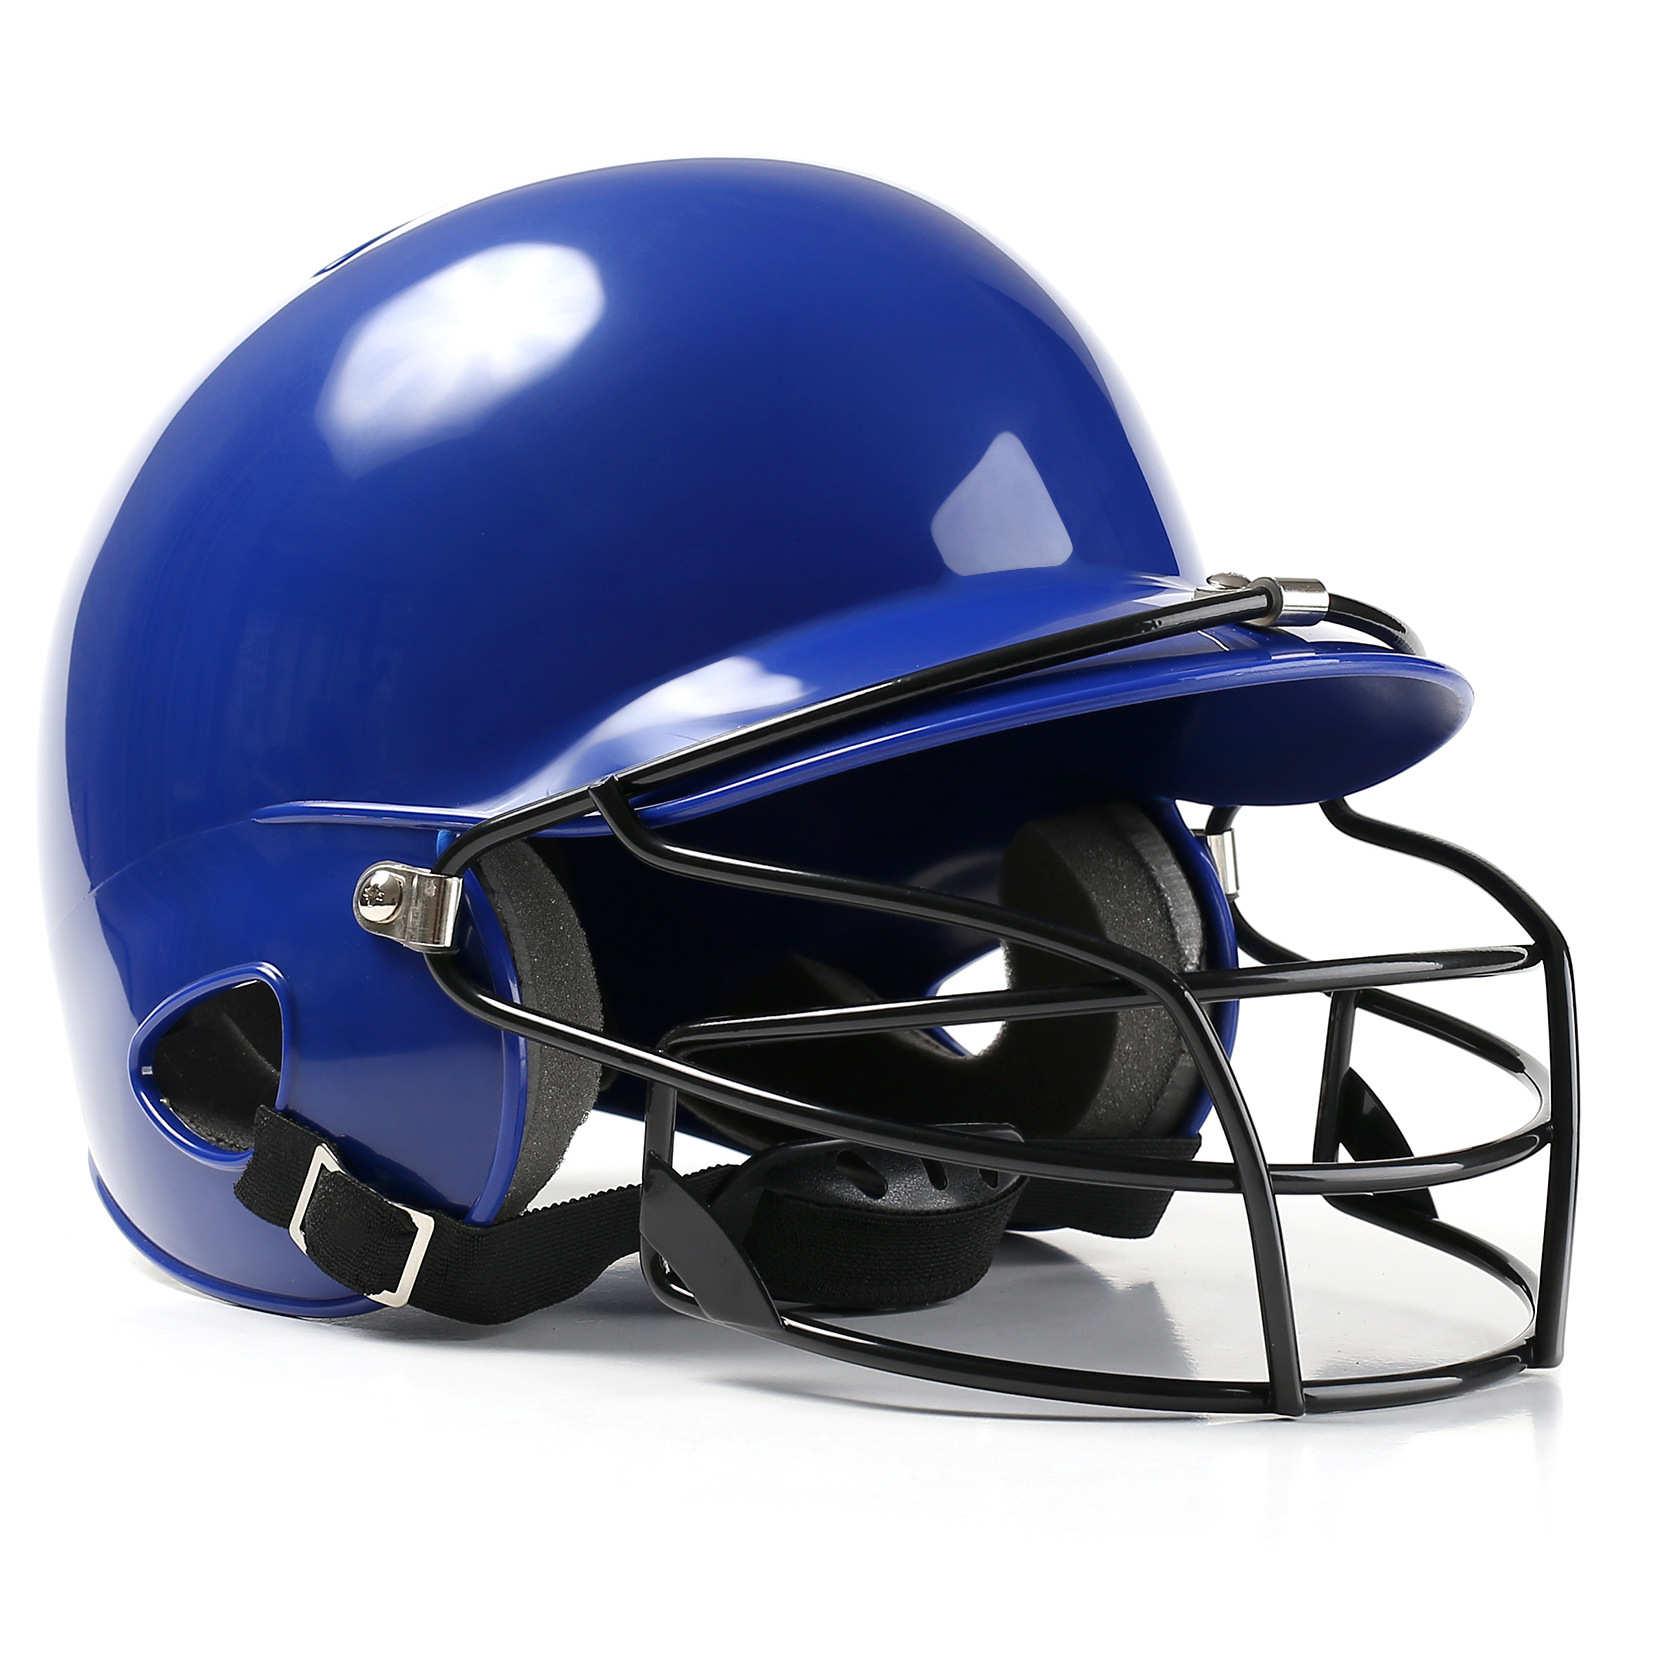 2019 casco de béisbol Unisex orejas transpirables protección completa de béisbol casco de seguridad cabeza guardia negro, rojo, azul